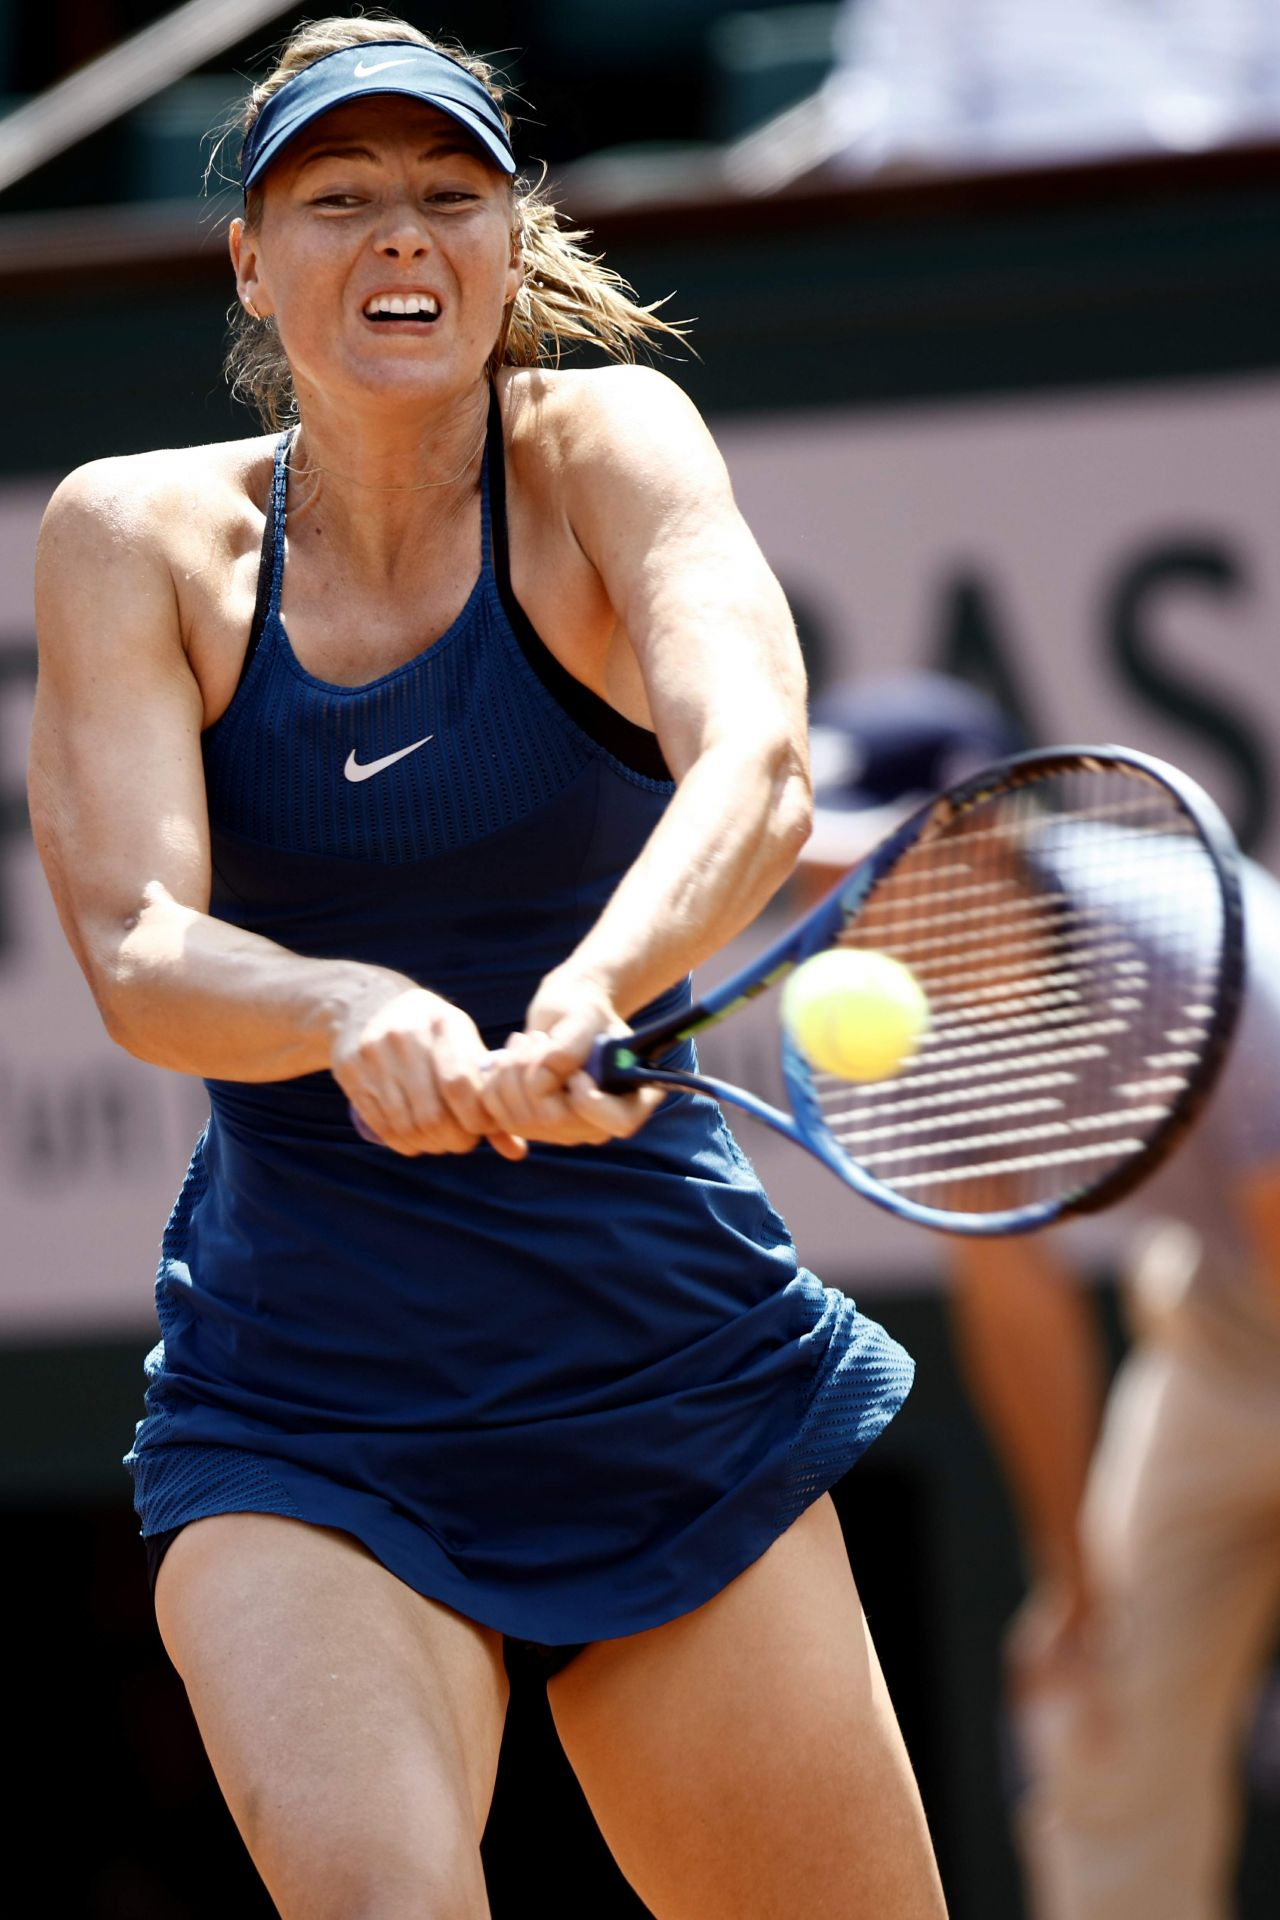 maria-sharapova-french-open-tennis-tournament-in-paris-06-02-2018-2.jpg